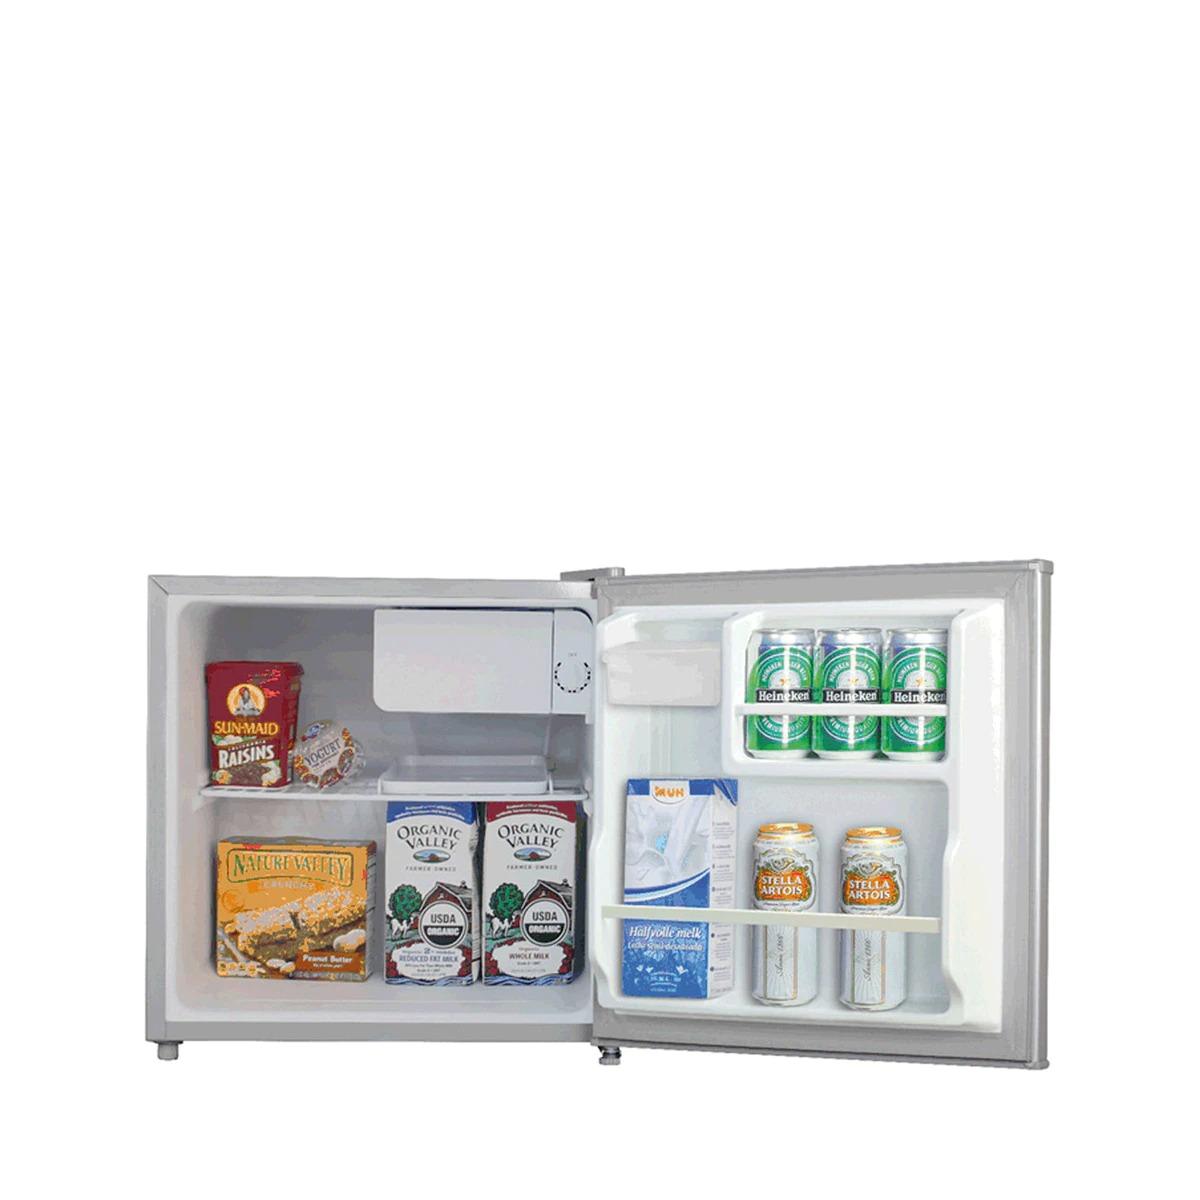 Saivod FSM614W mini fridge with 45 liter capacity